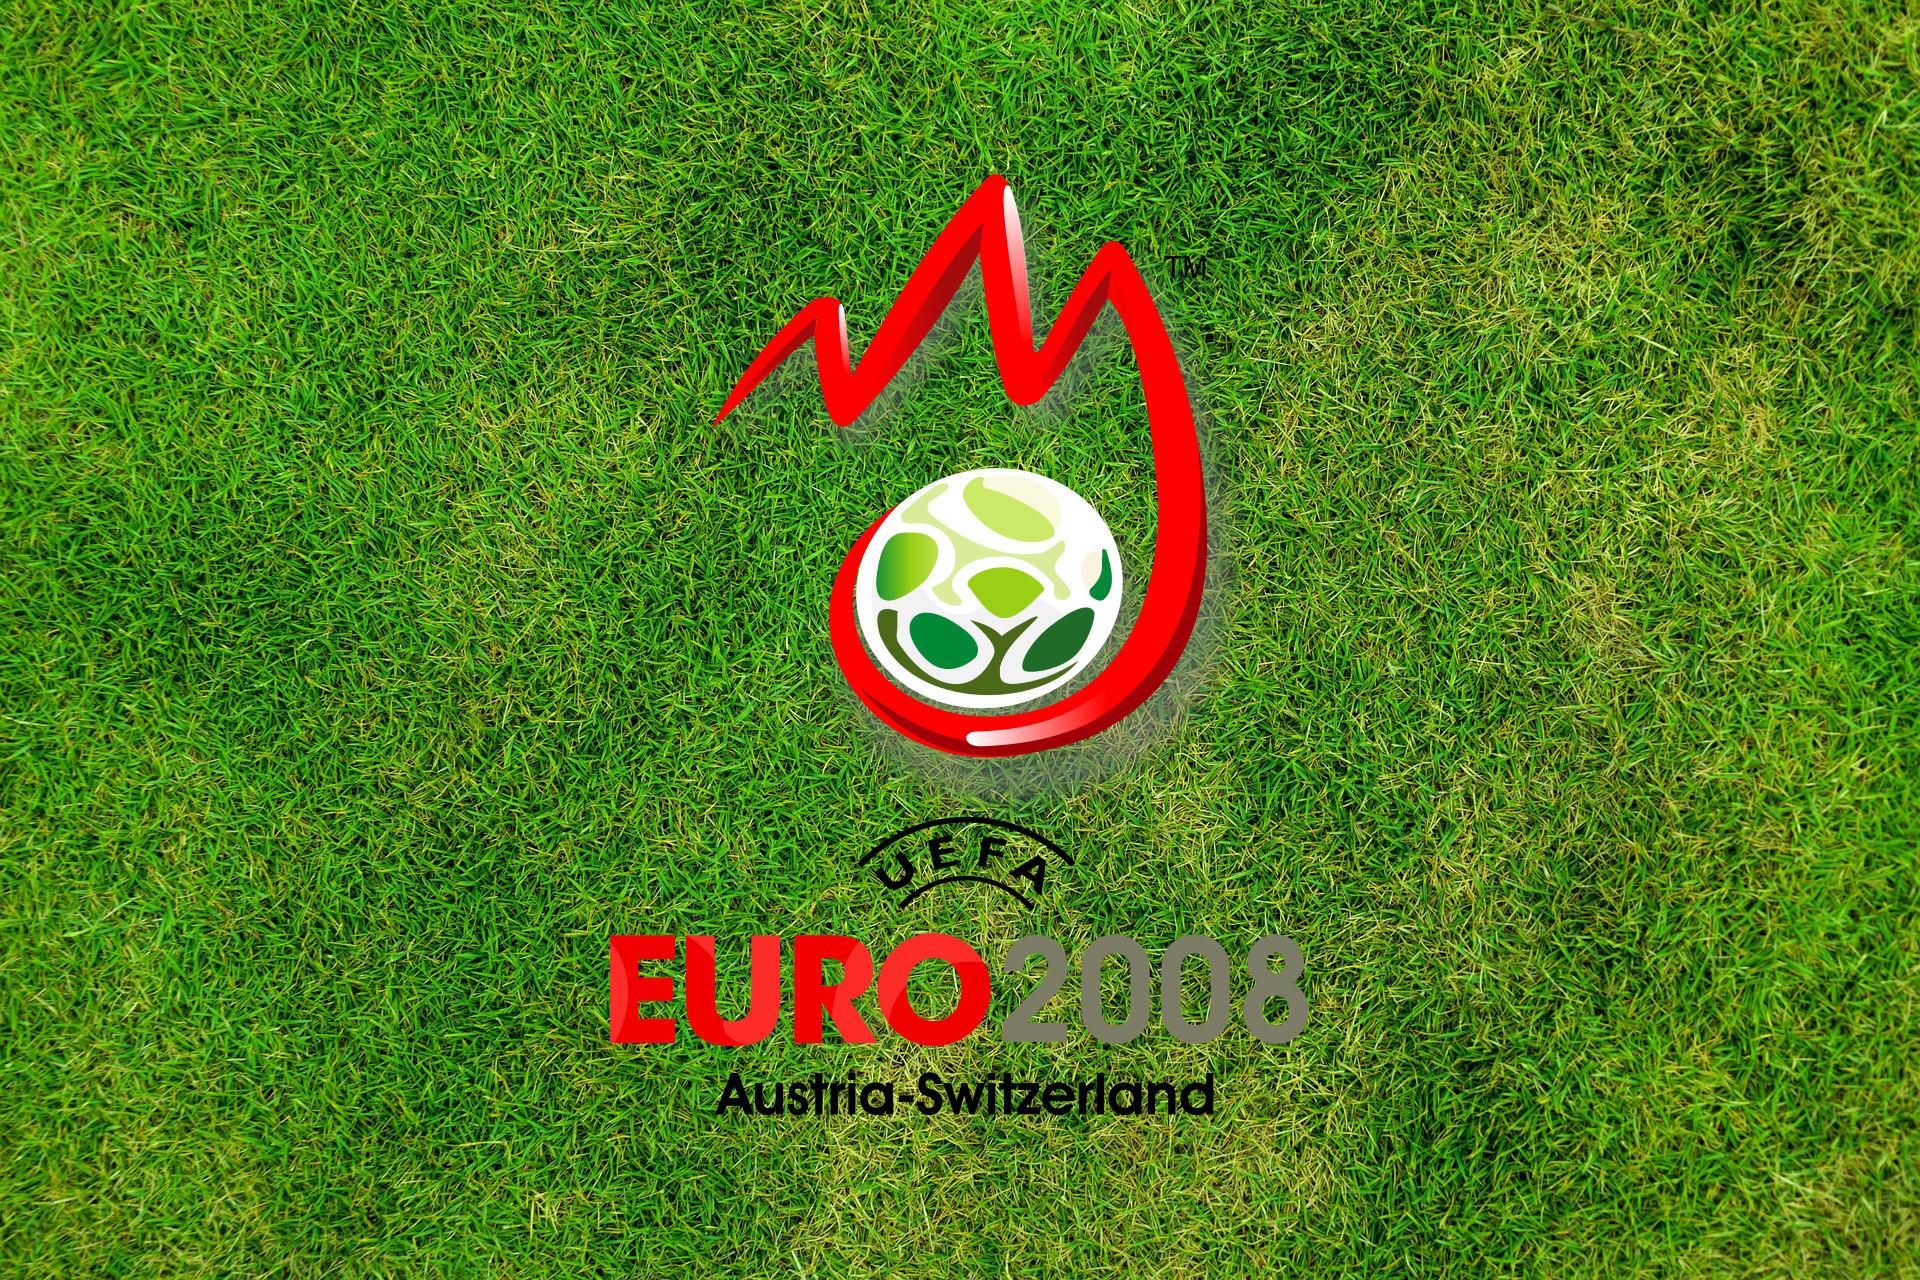 Ole Ole! Spaniards Wins Euro Cup 2008